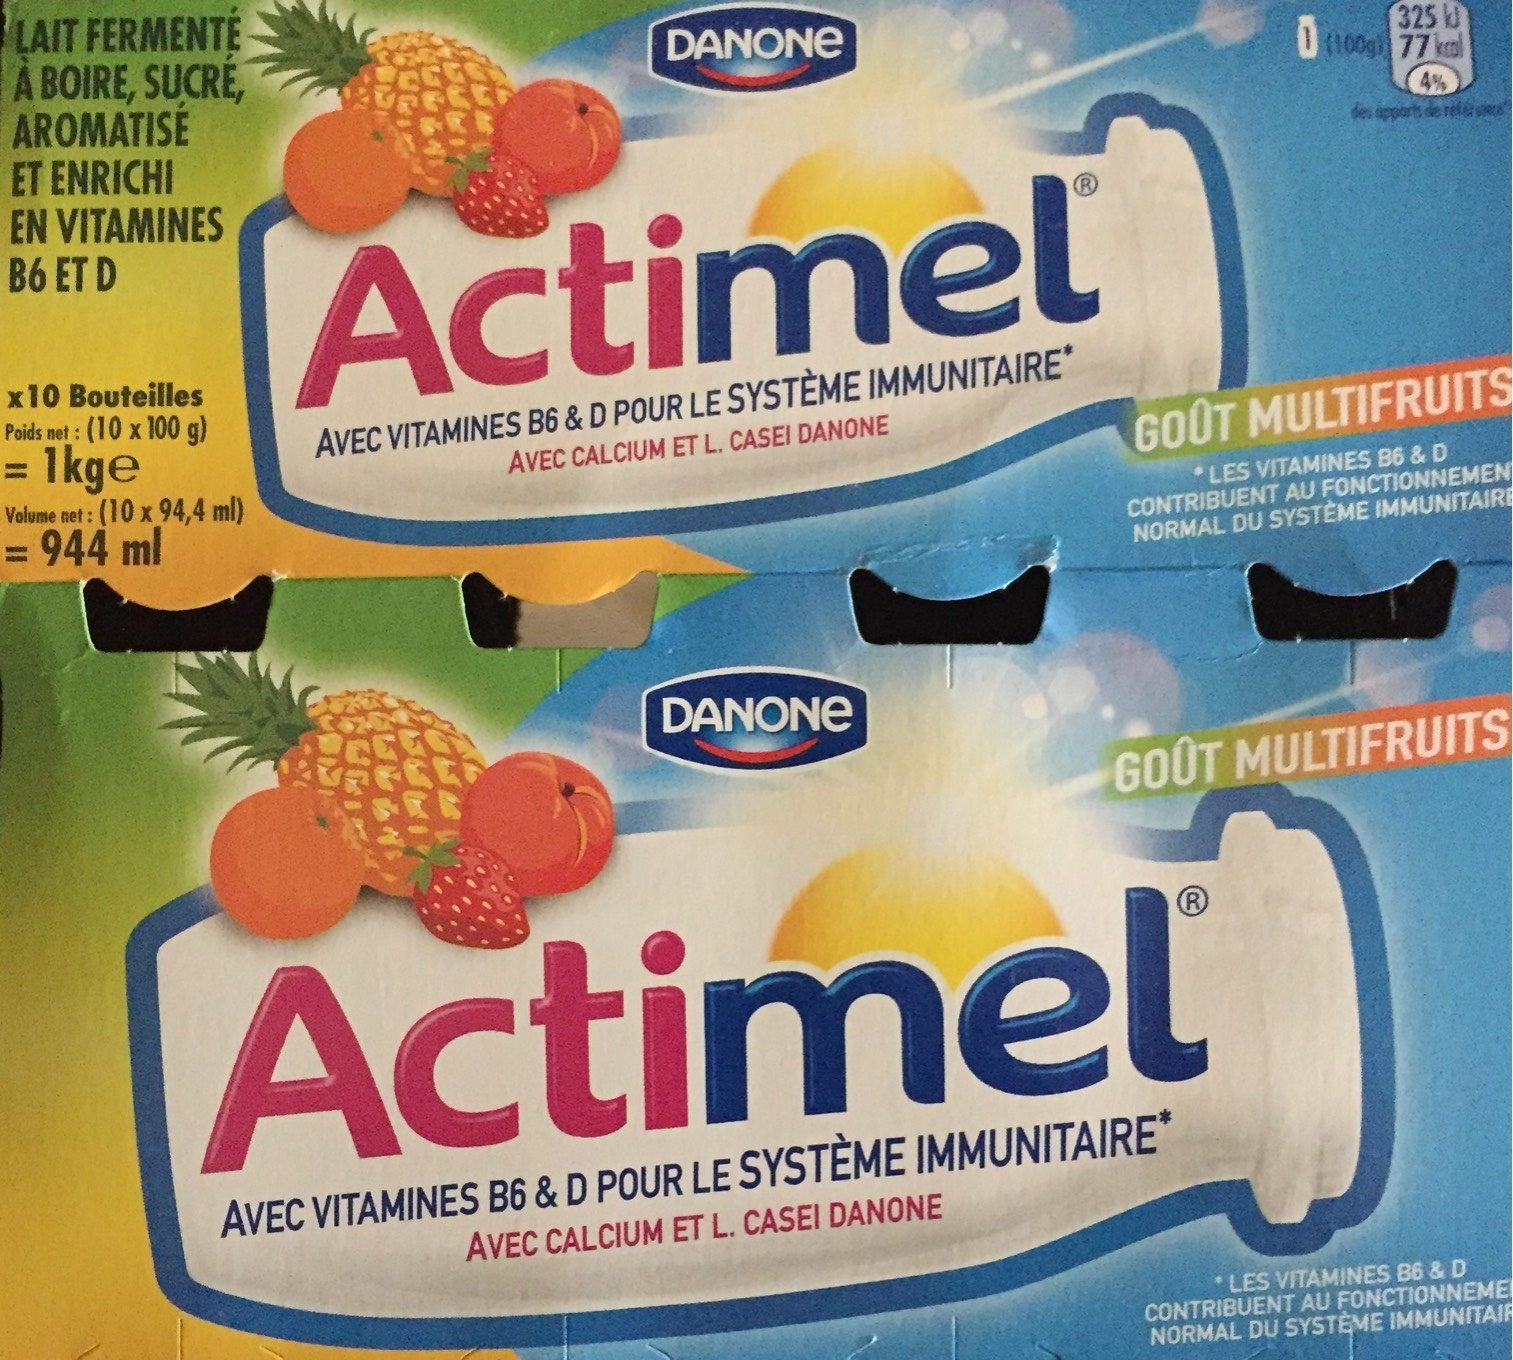 Actimel multifruits - Product